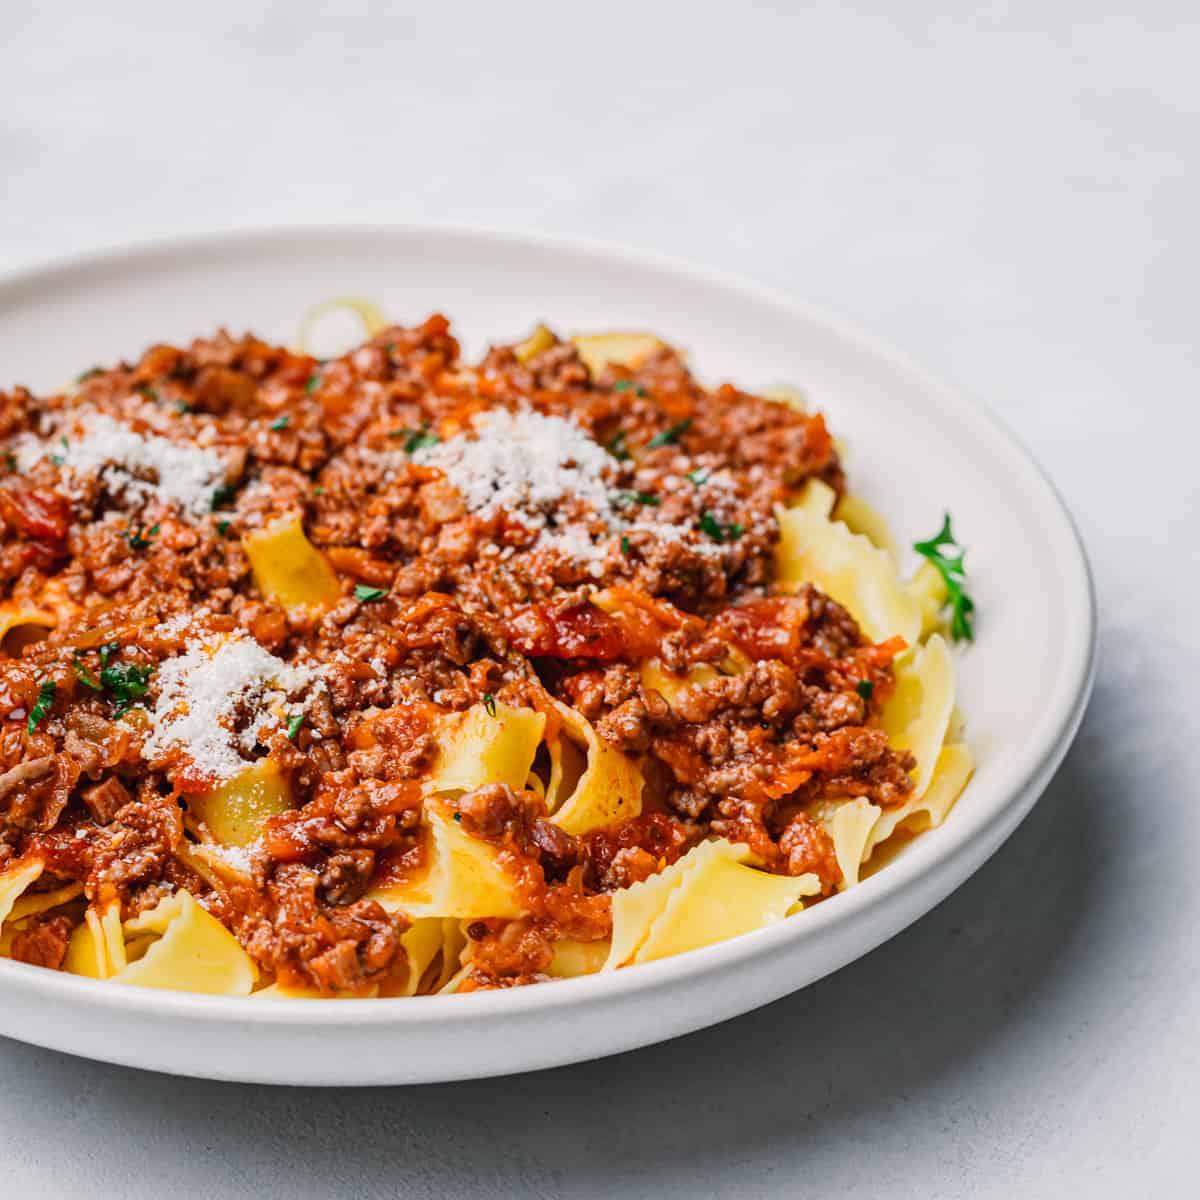 Pasta with Italian Meat Sauce